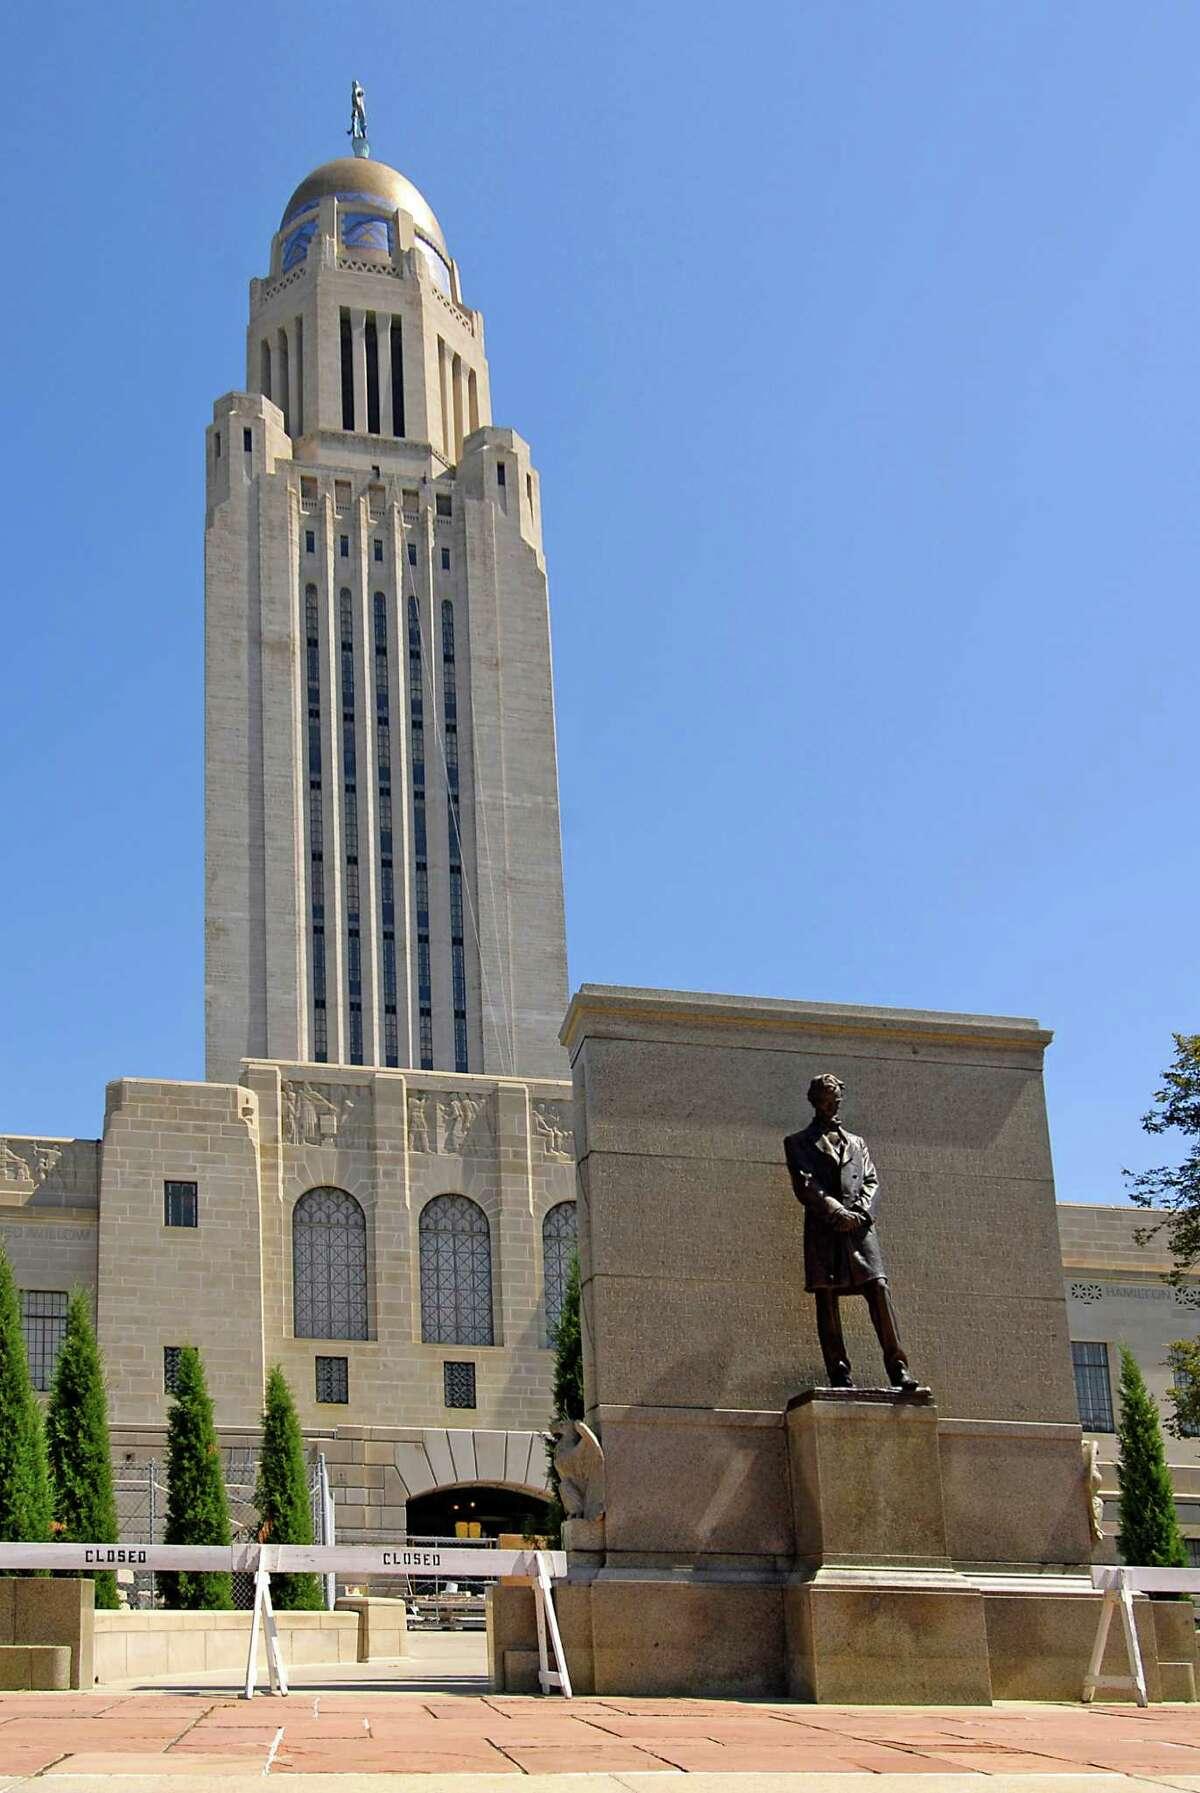 19. Lincoln, Nebraska Population: 269, 726 LivScore: 660Civic: 63 Demographics: 45 Economy: 70 Education: 72 Health: 67 Housing: 80 Infrastructure: 54